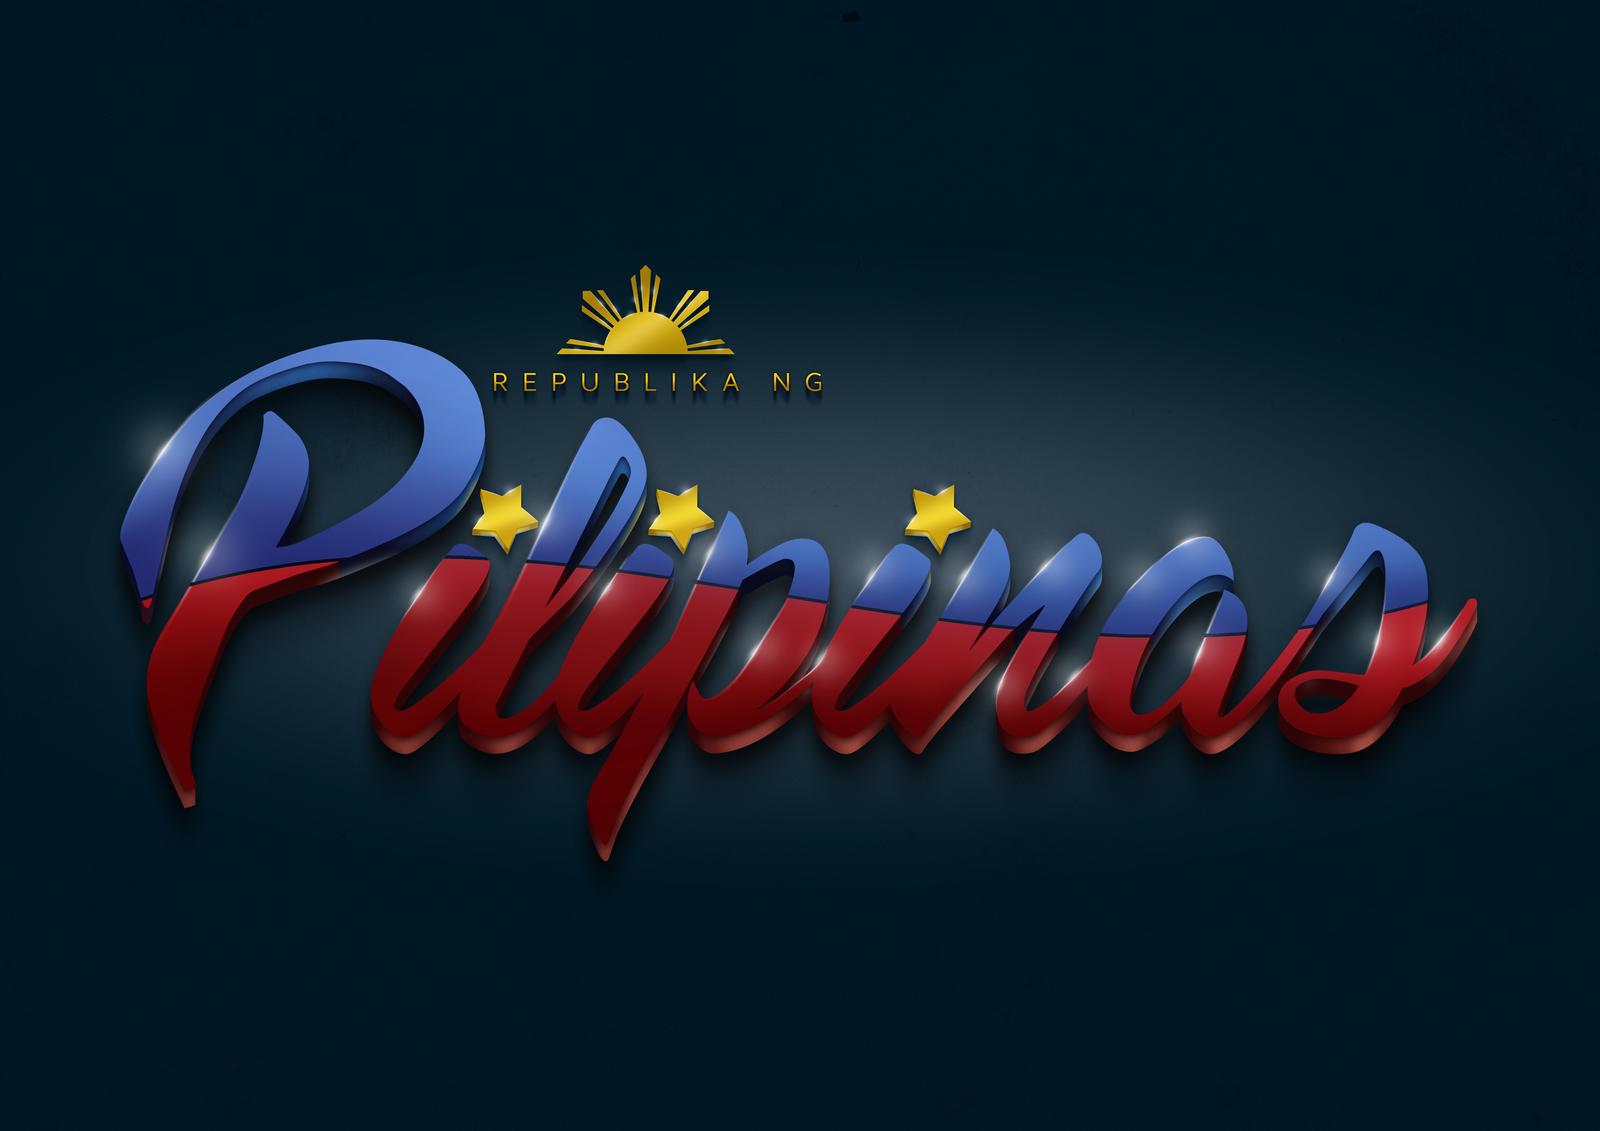 Pilipinas by nikpalma